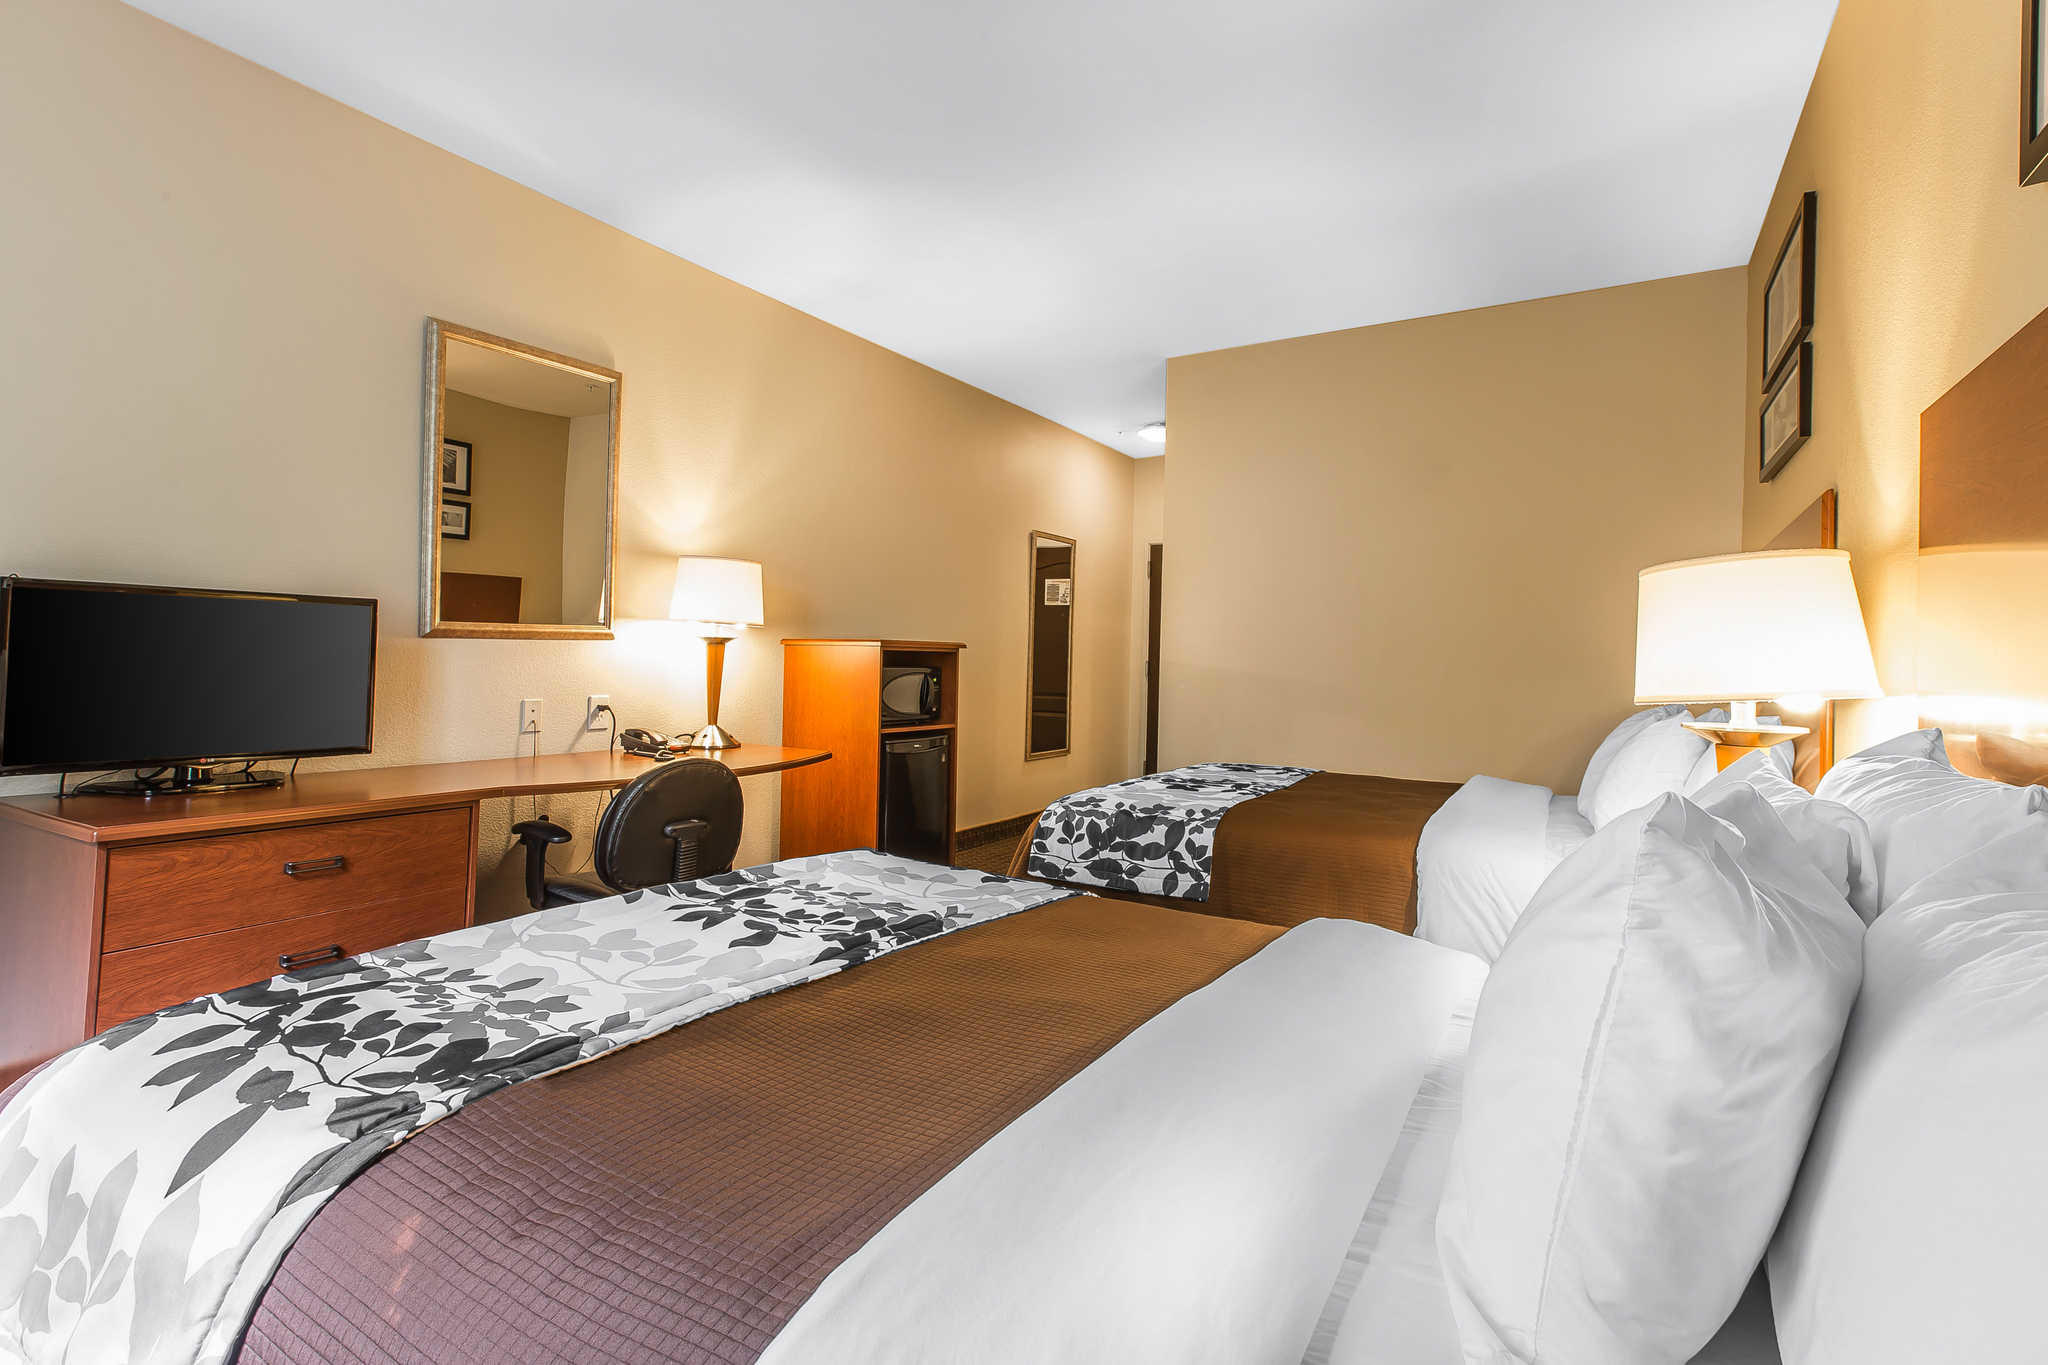 Sleep Inn & Suites At Kennesaw State University image 18